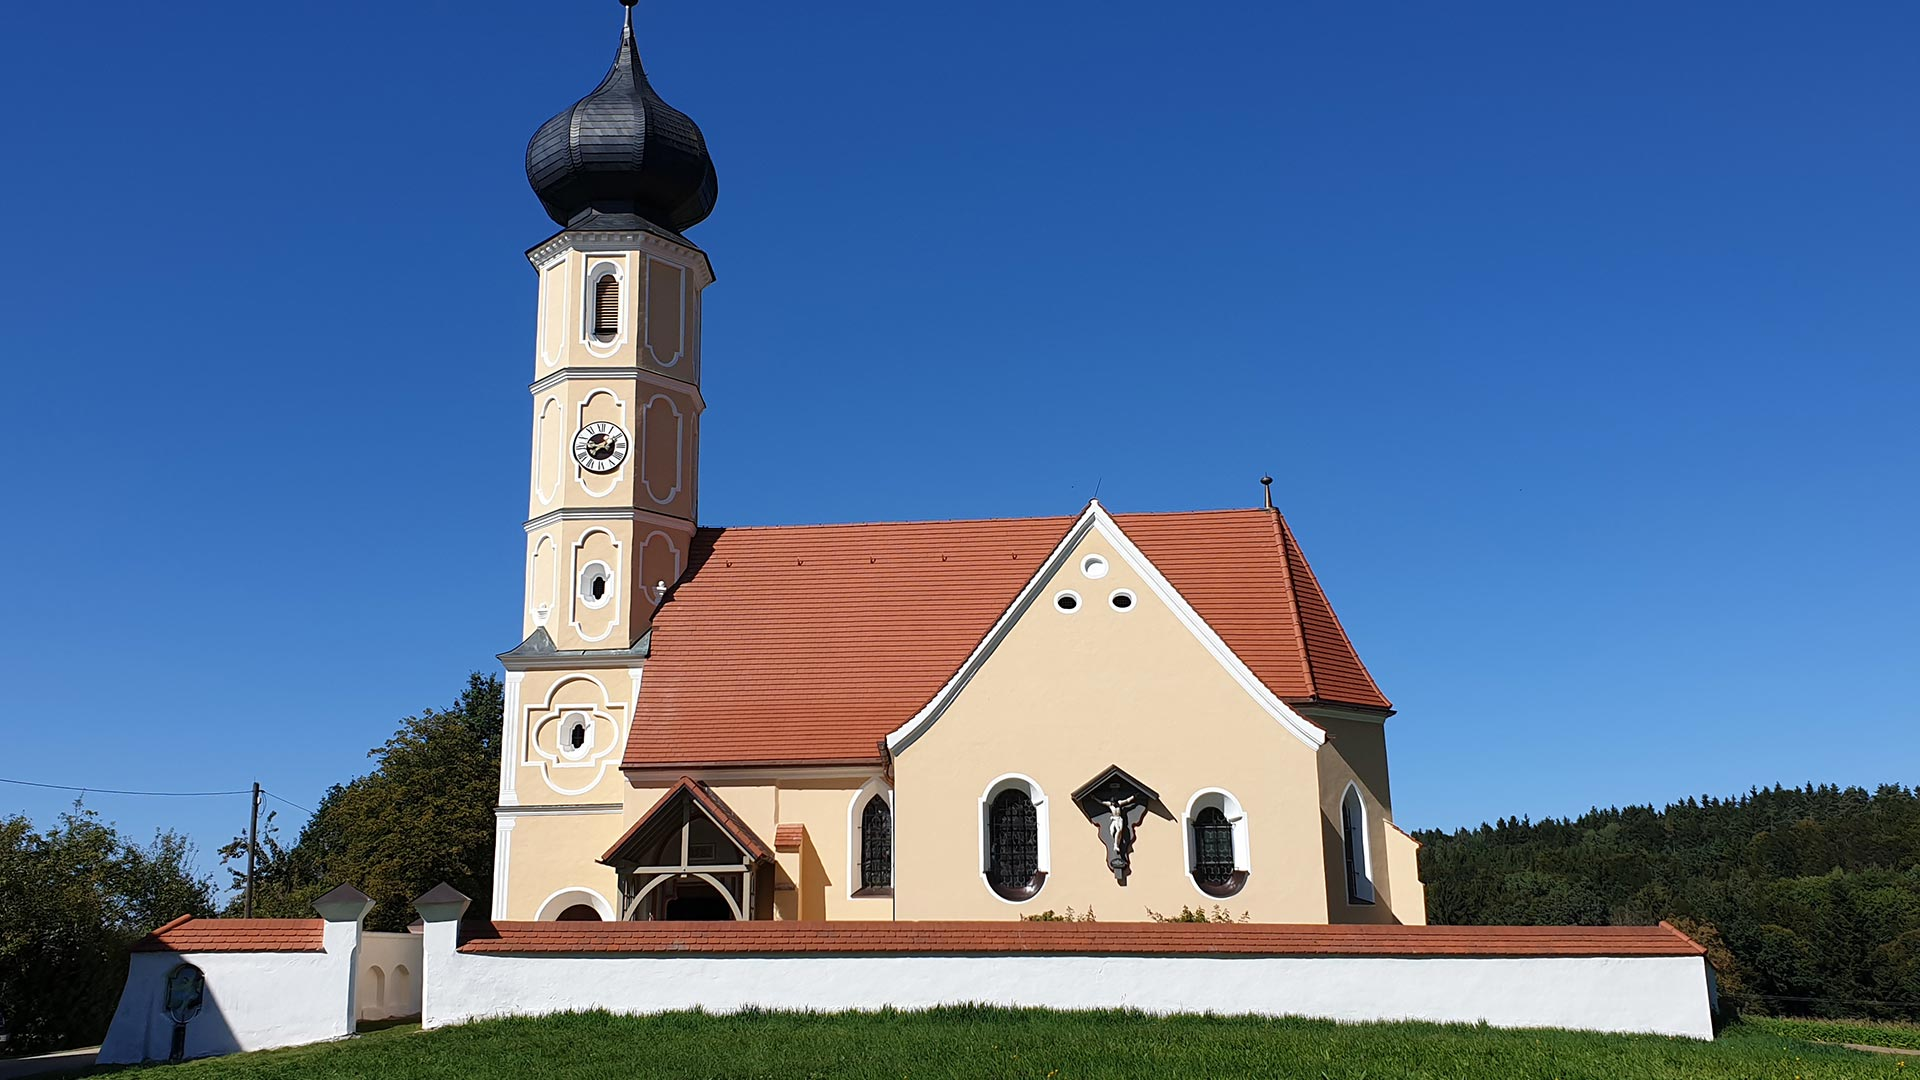 Kirche in Leonberg - Fassade